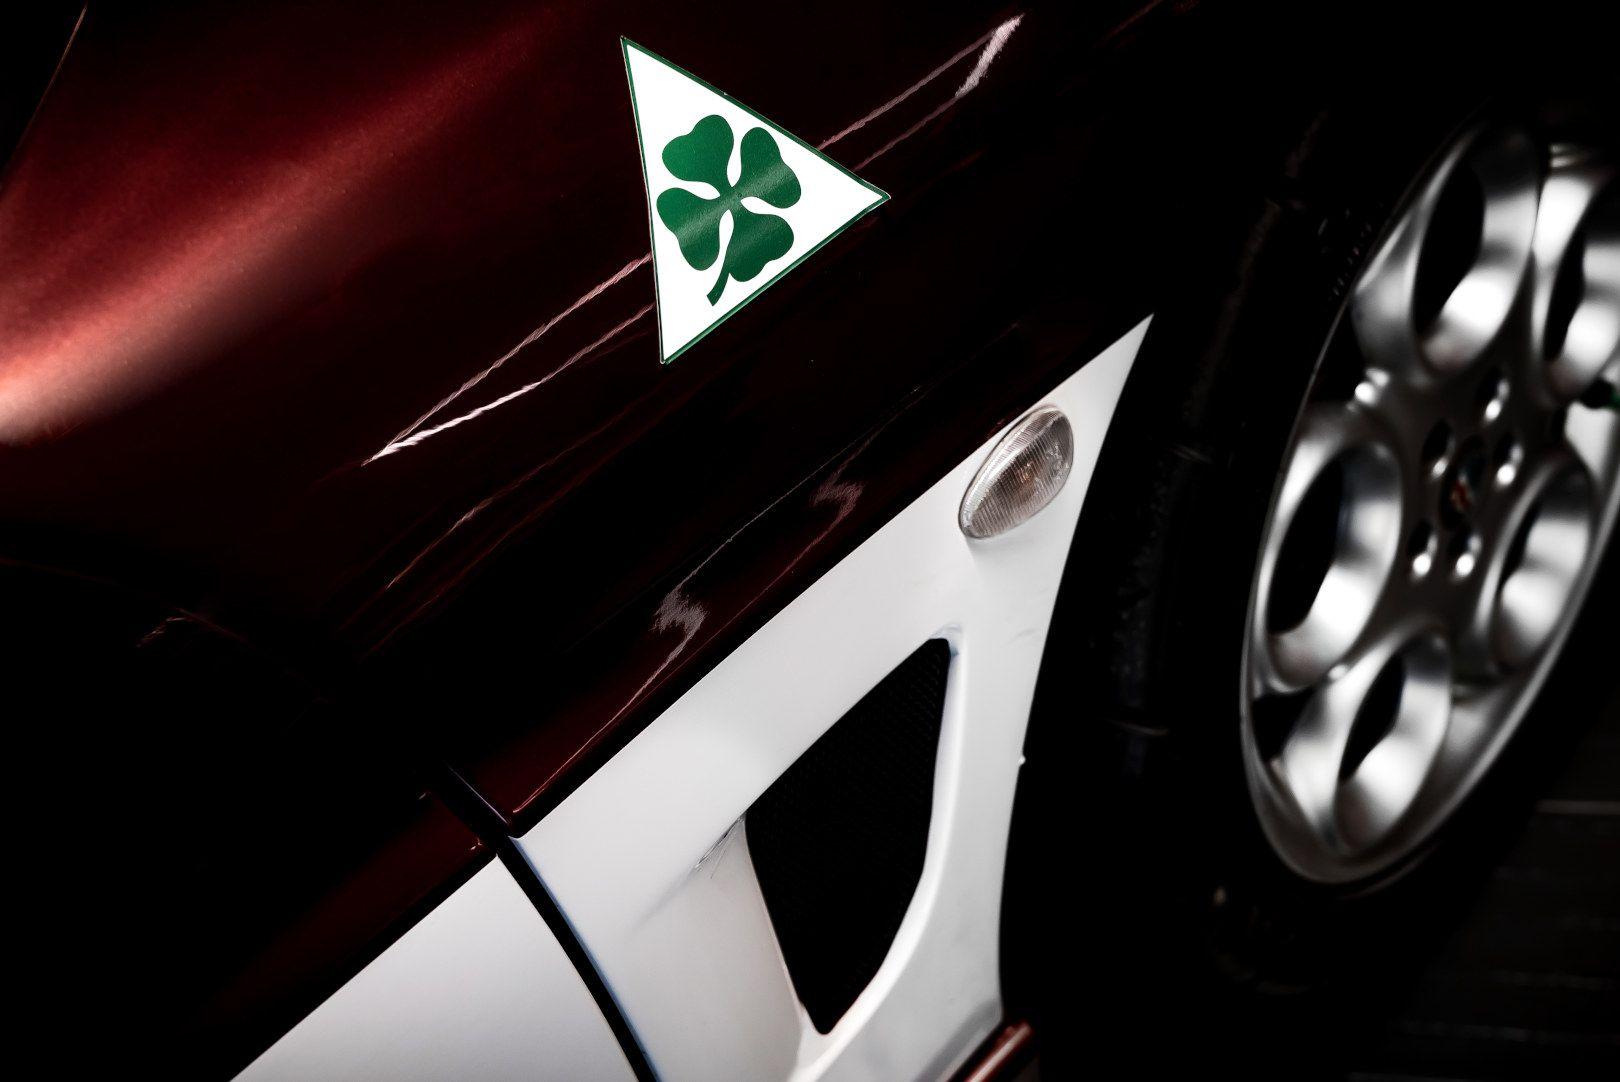 1995 Alfa Romeo GTV 2.0 V6 Turbo Cup Replica 57184